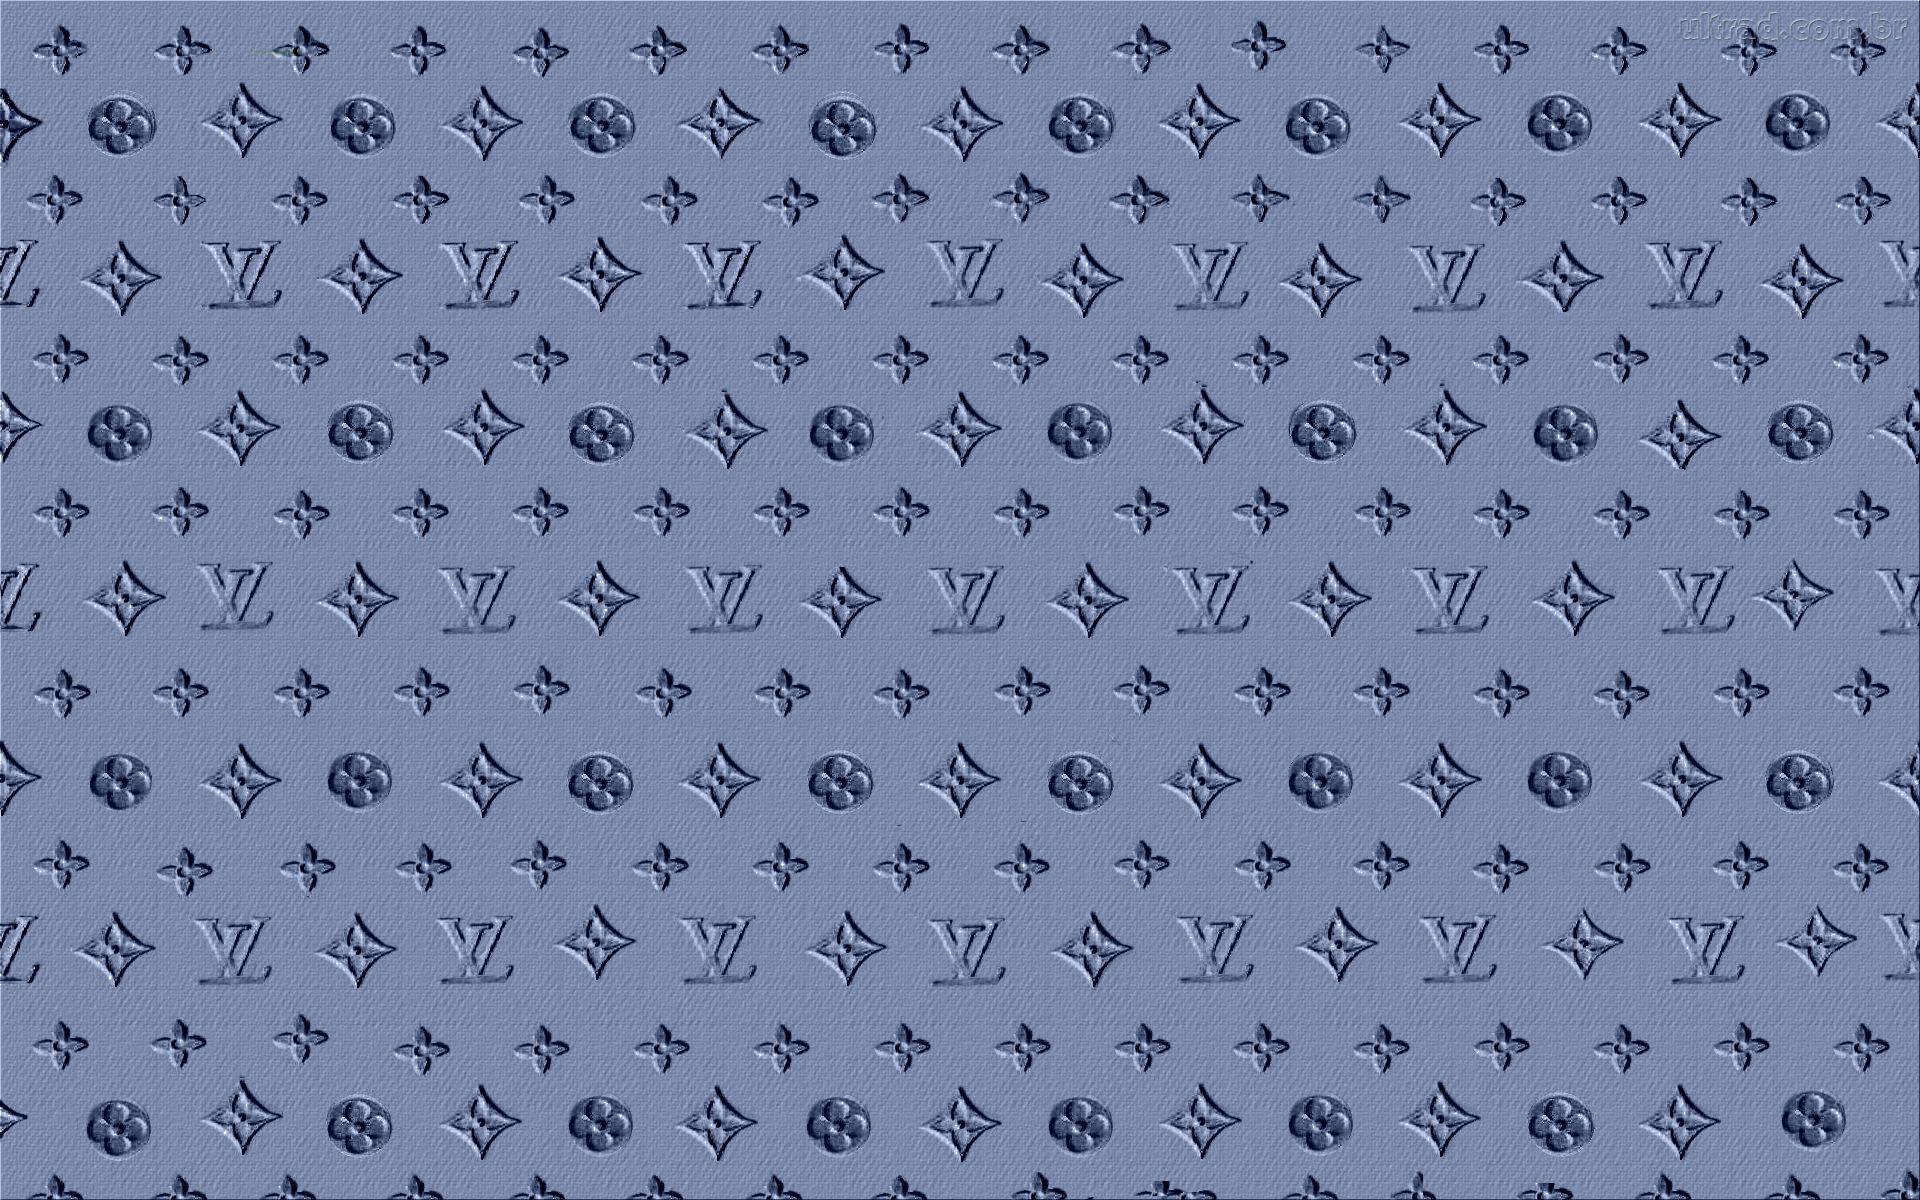 Papel De Parede Louis Vuitton Louis Vuitton Papeis De Parede Wallpaper